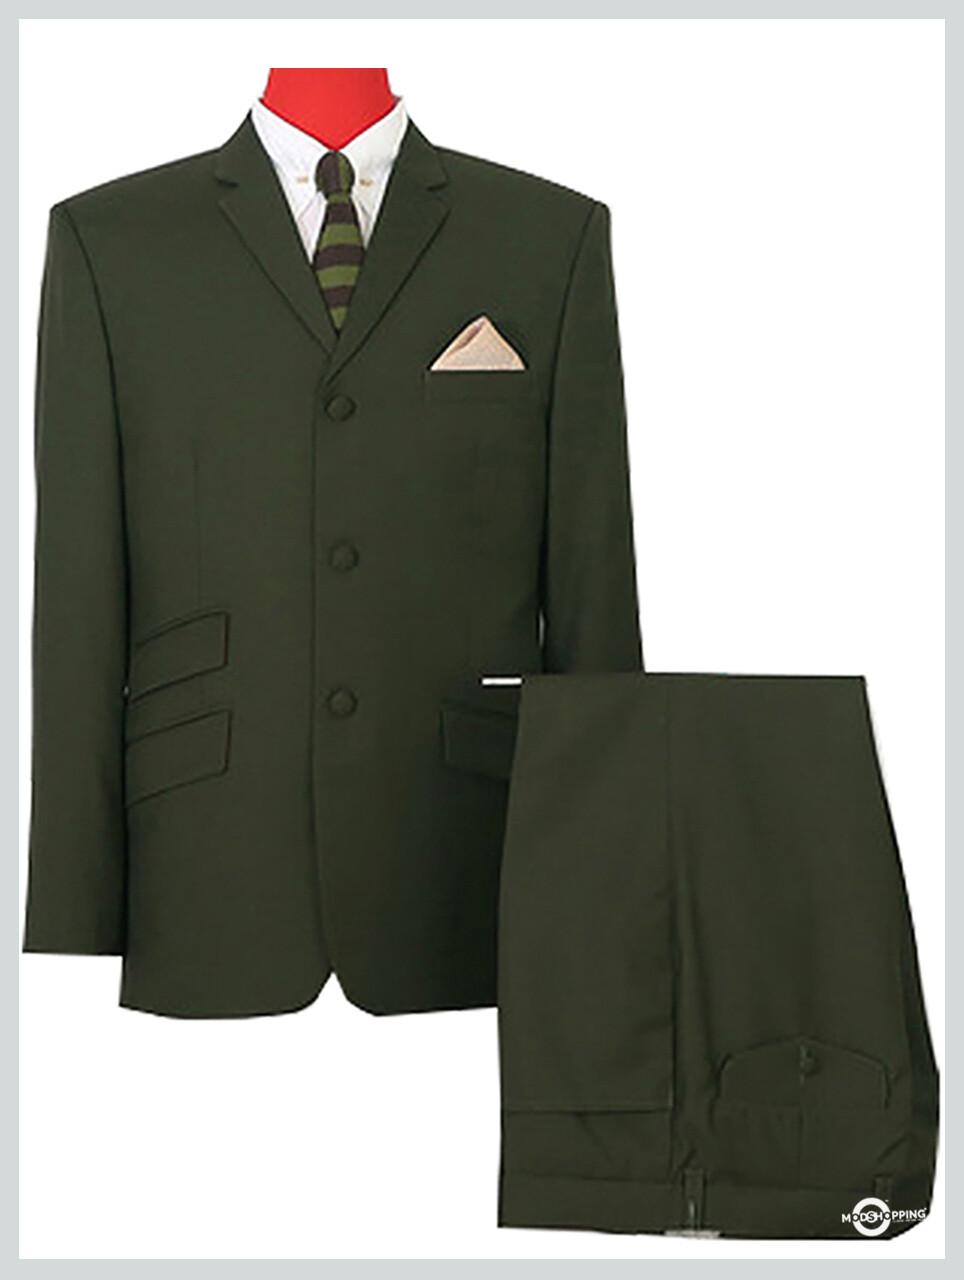 Vintage Olive Green Mohair Mod Suit.